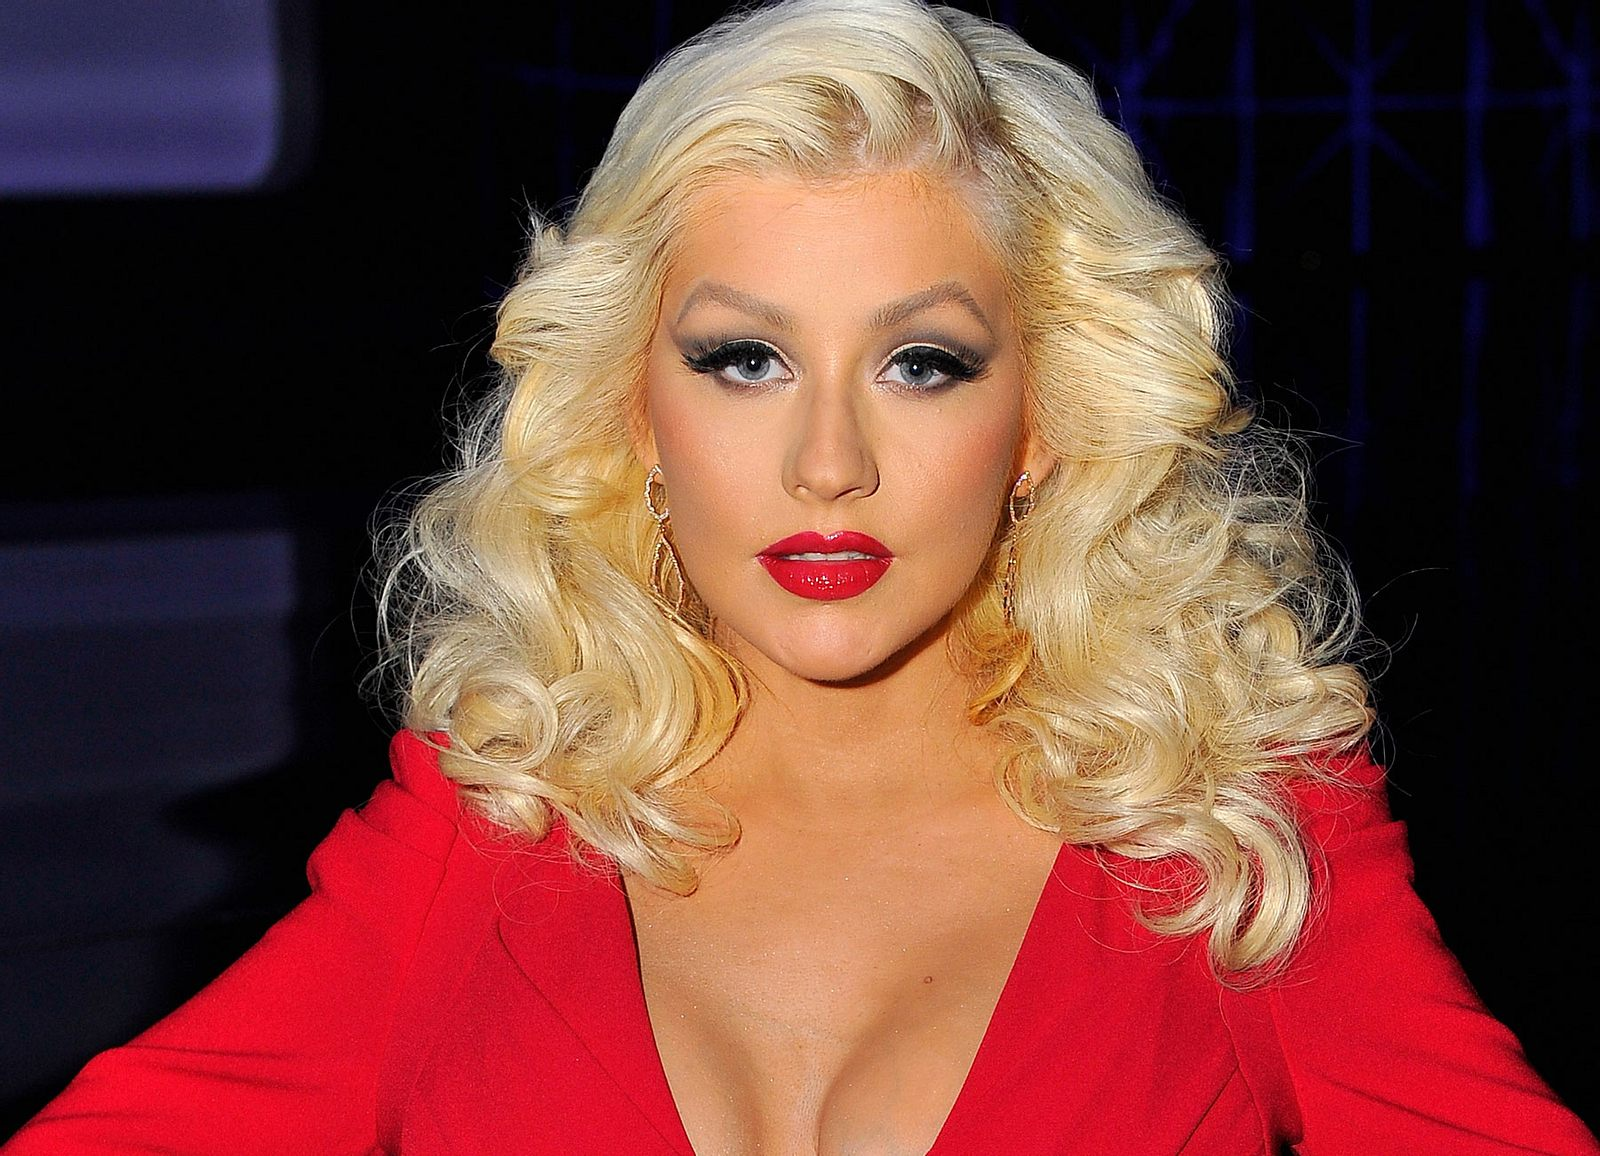 Atemberaubend! US-Superstar Christina Aguilera zieht